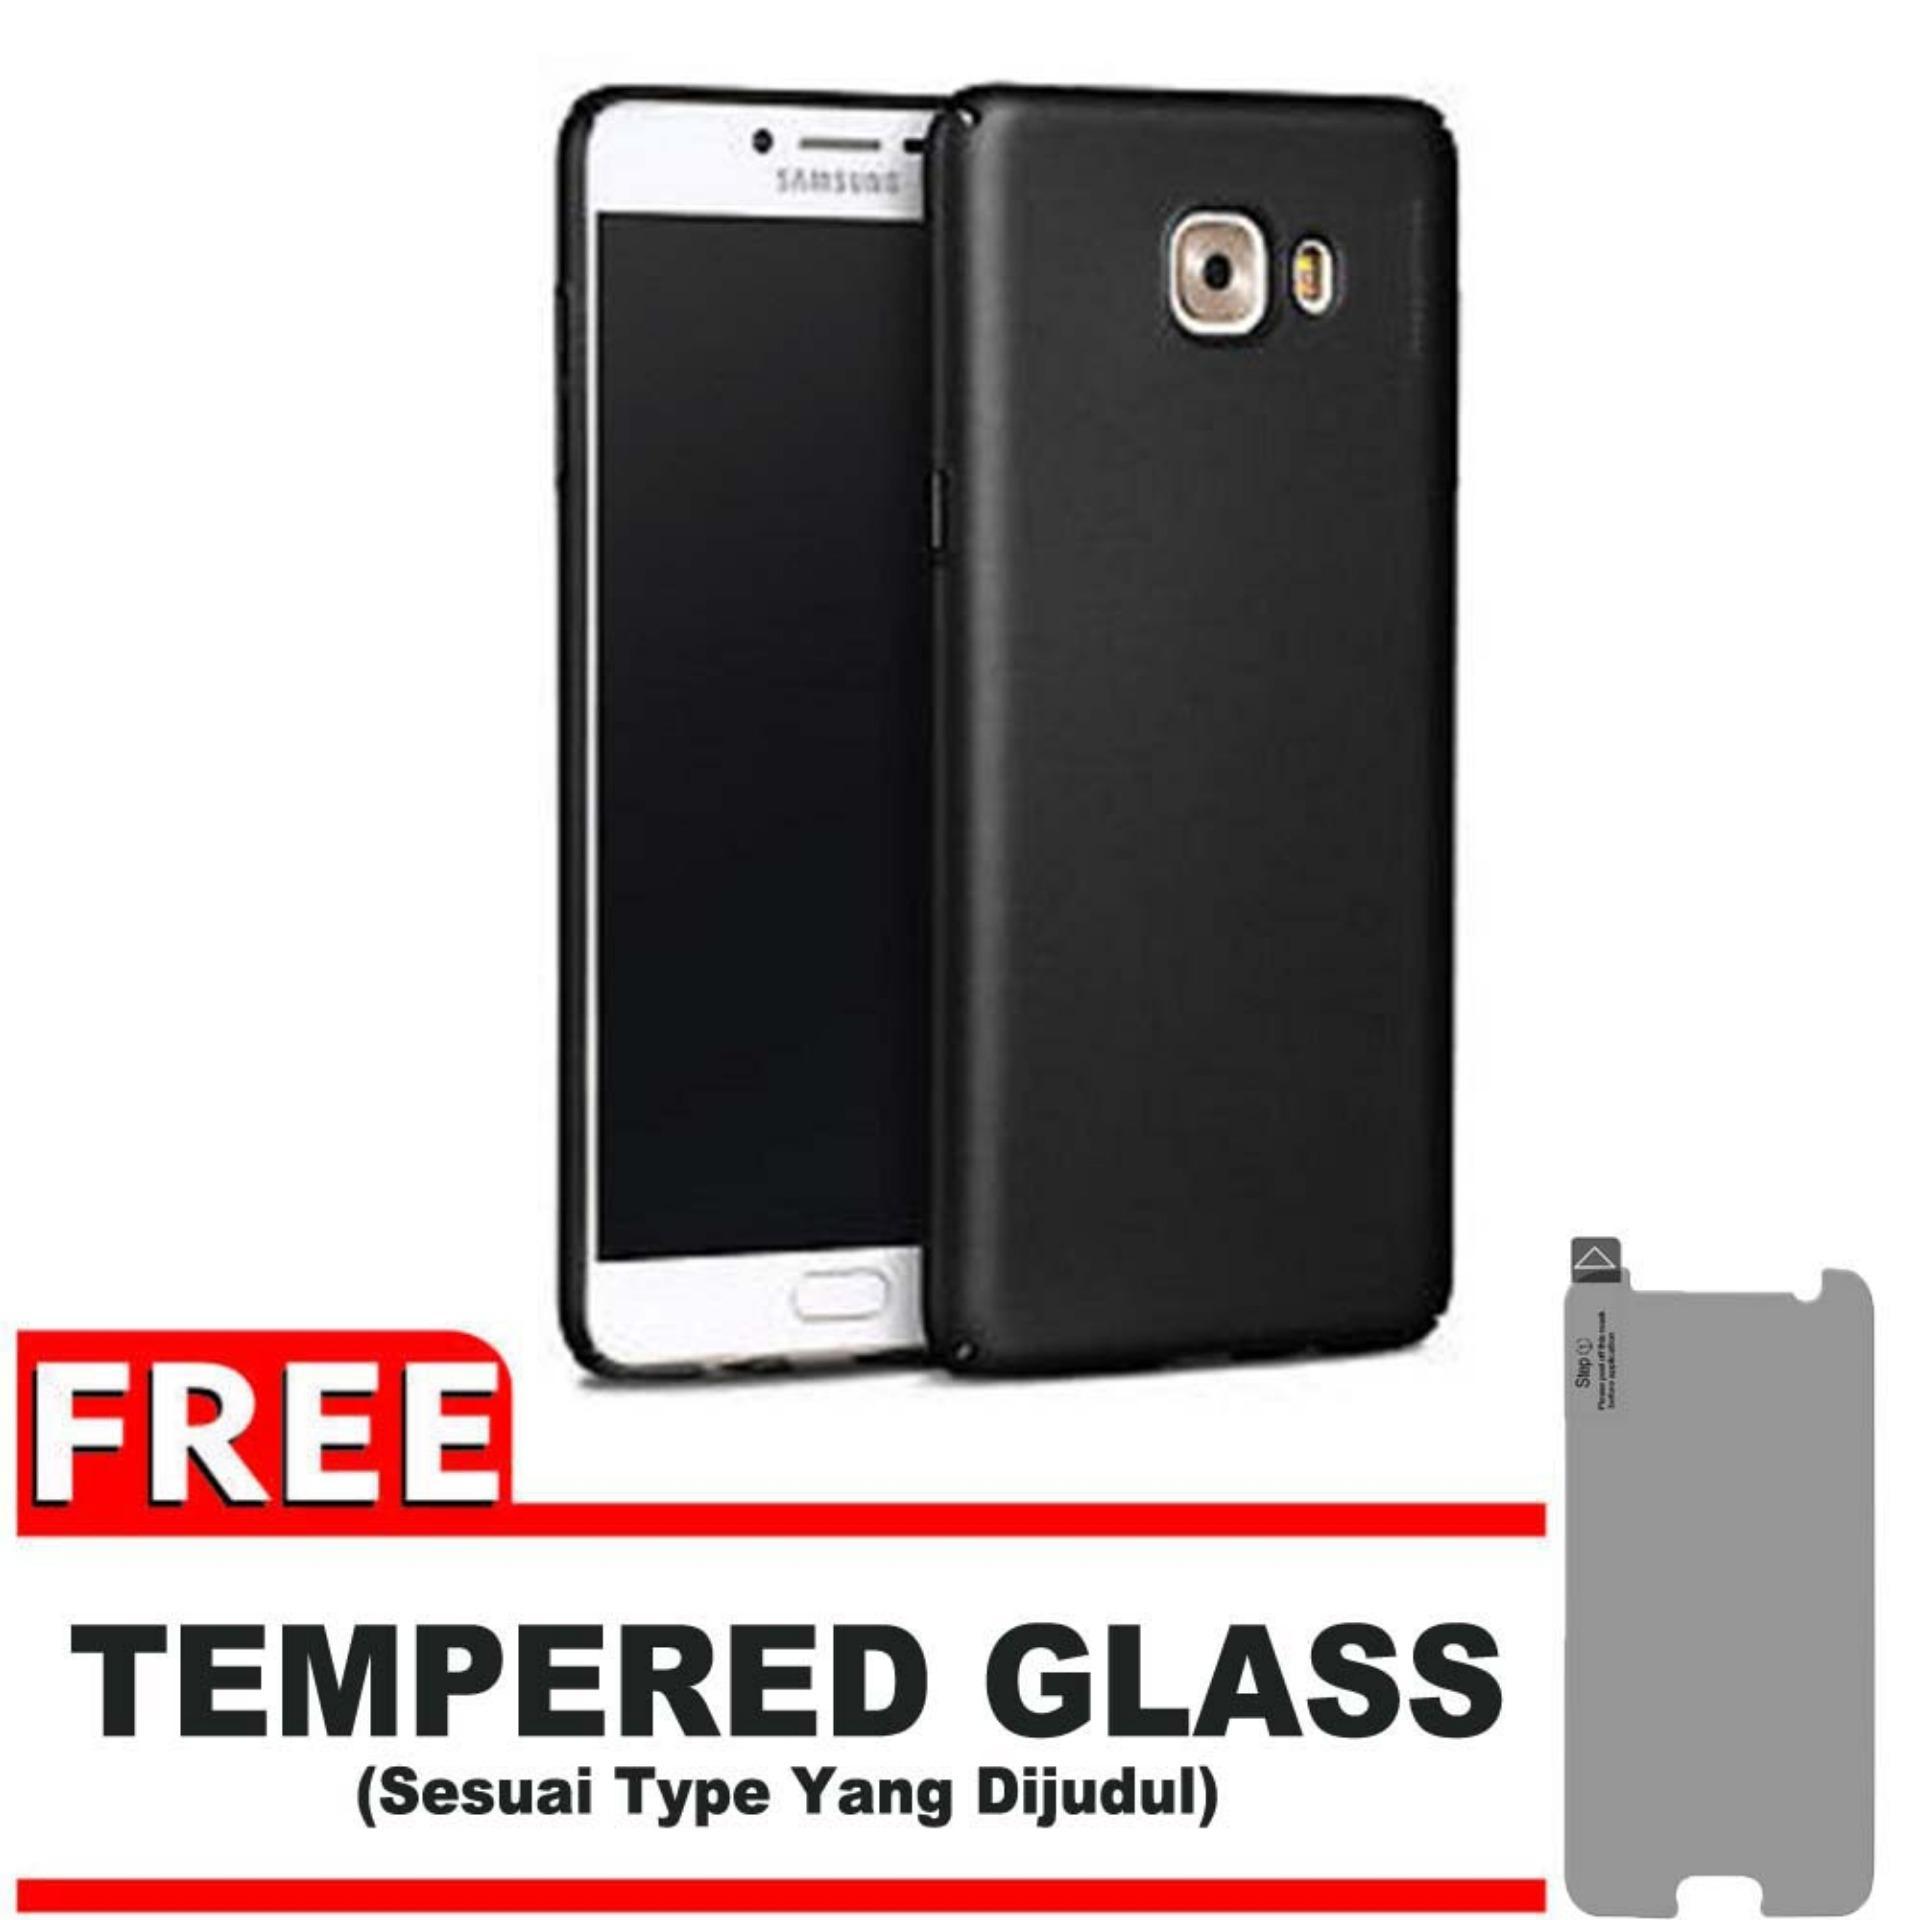 DarkNight for Samsung Galaxy C9 / C9 Pro / 4G LTE / Duos | Slim Case Black Matte Softcase Premium (Anti Minyak/Anti Sidik Jari) - Gratis Free Tempered Glass Protector - Hitam Doff